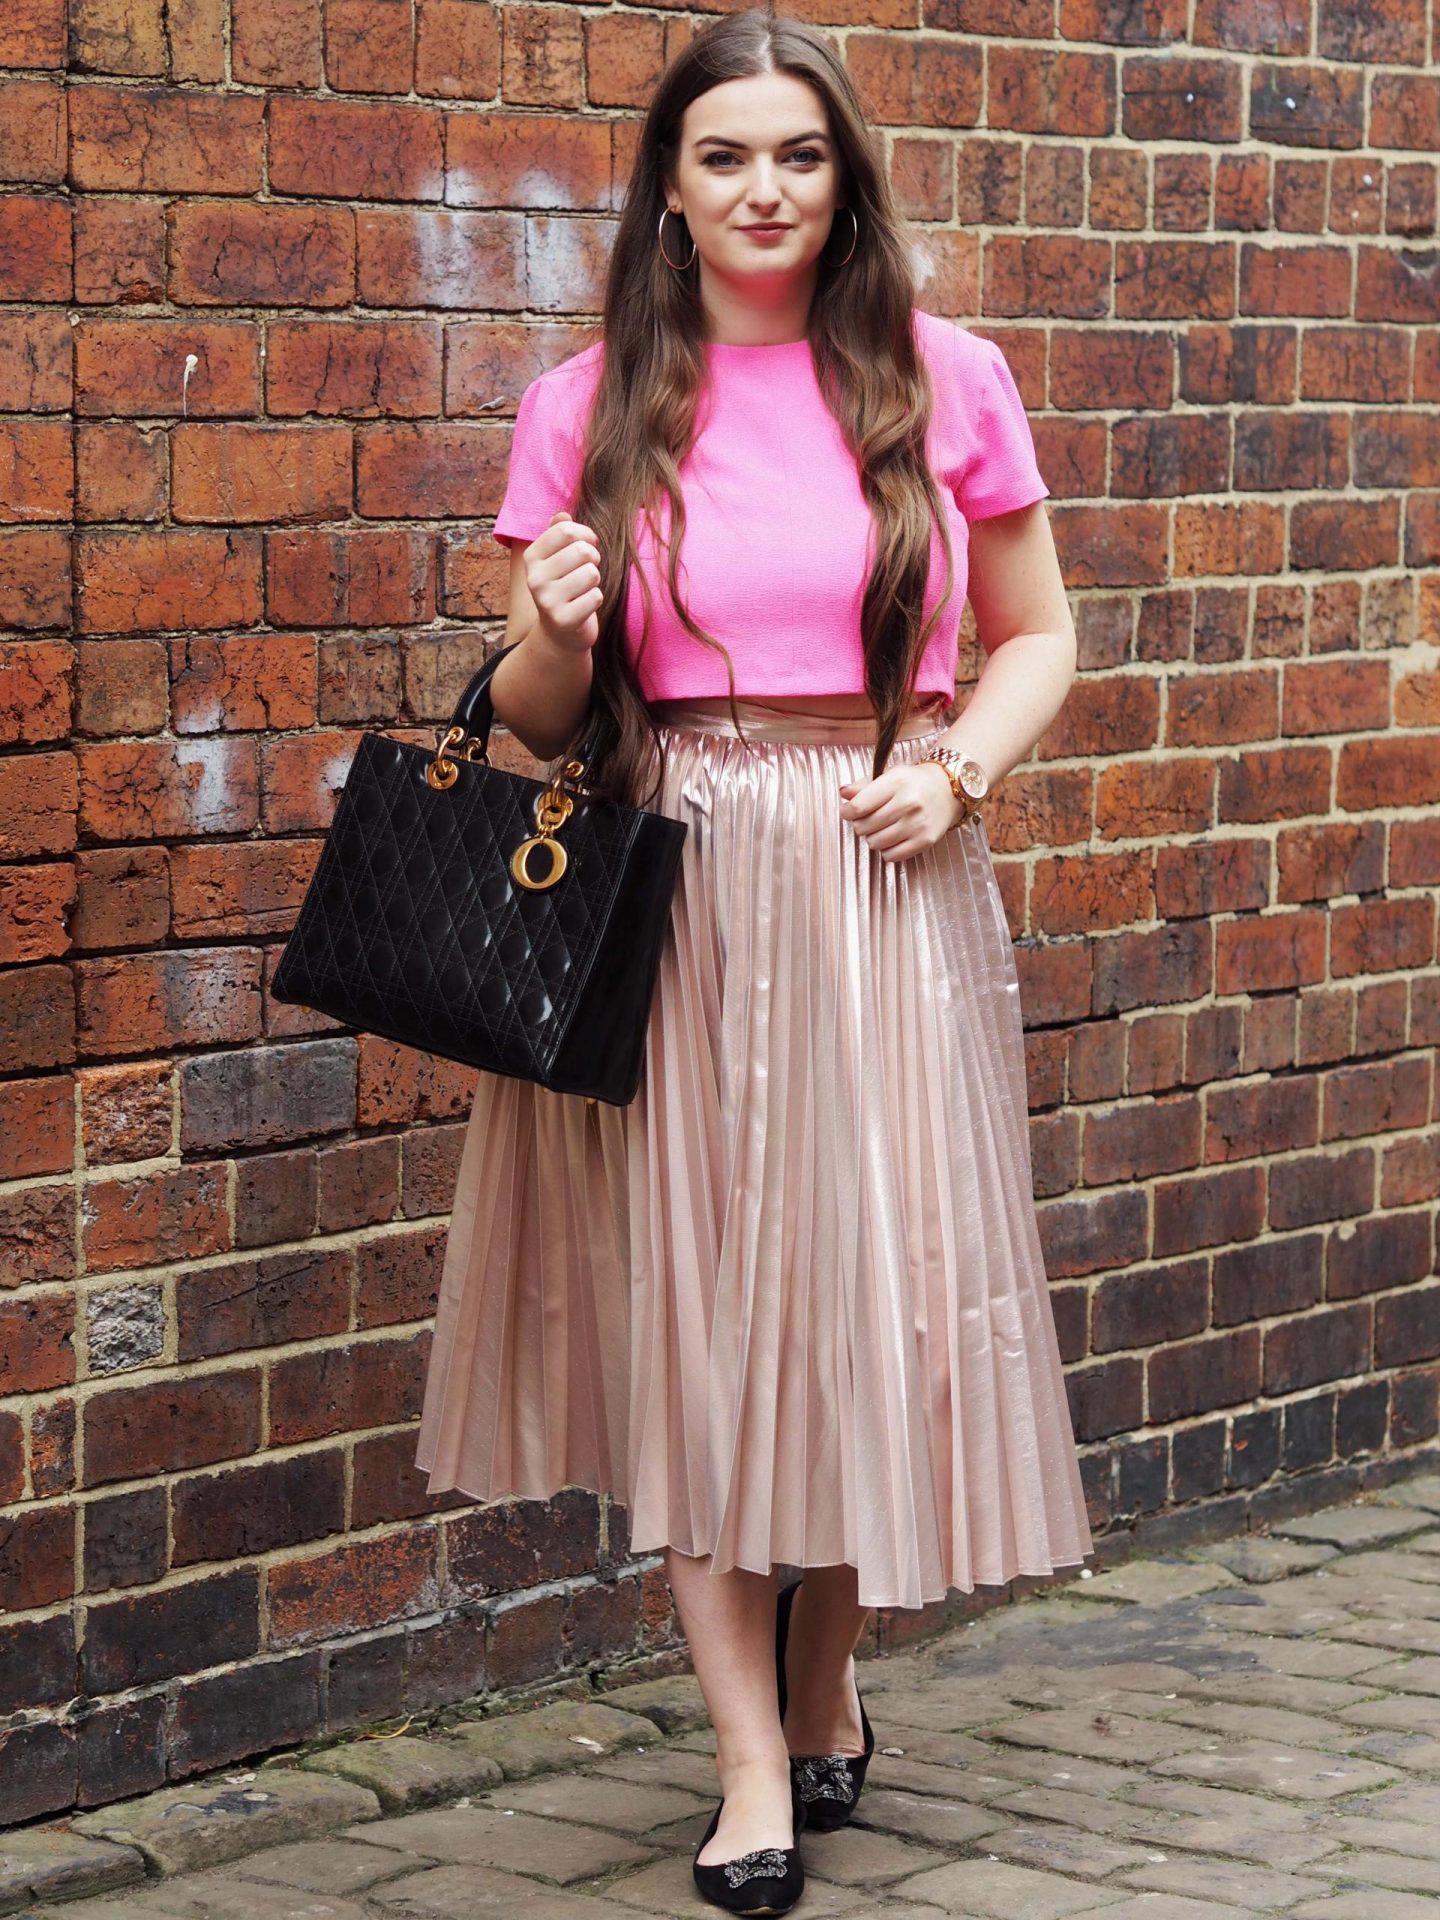 closet-london-pink-skirt-bloggers-blog-awards-2016-rachel-nicole-uk-blogger-3